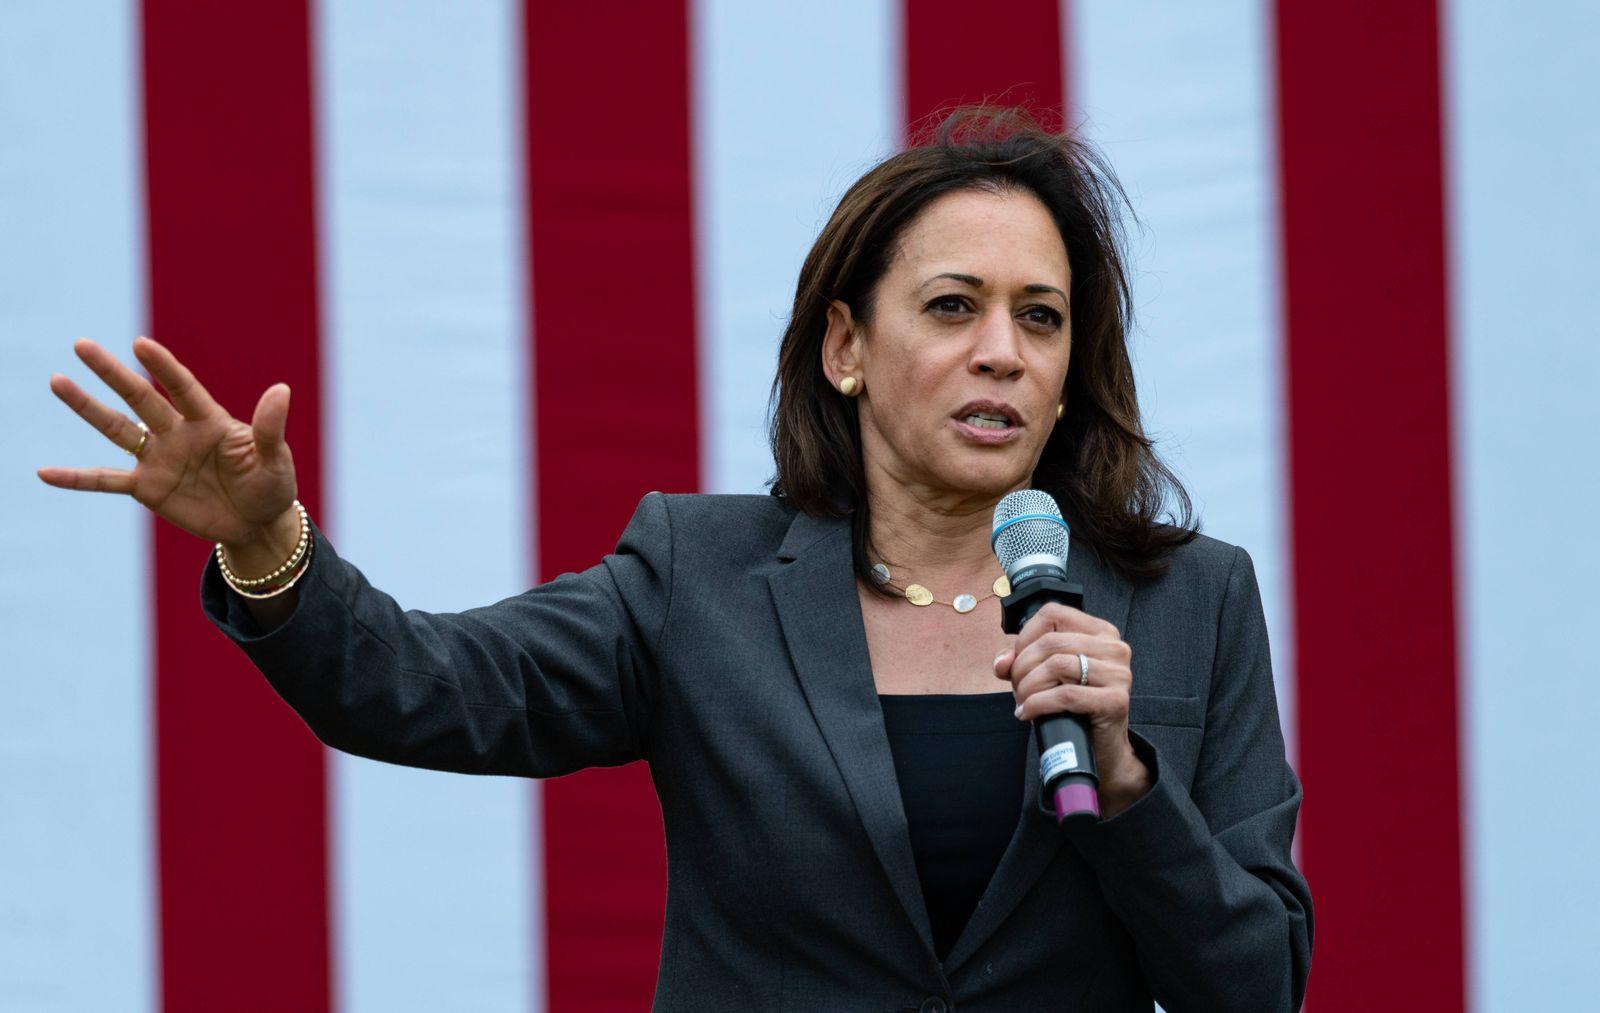 September 6, 2019, Mac s Apples, Londonderry, New Hampshire, USA: Democratic Presidential candidate Senator Kamala Harr